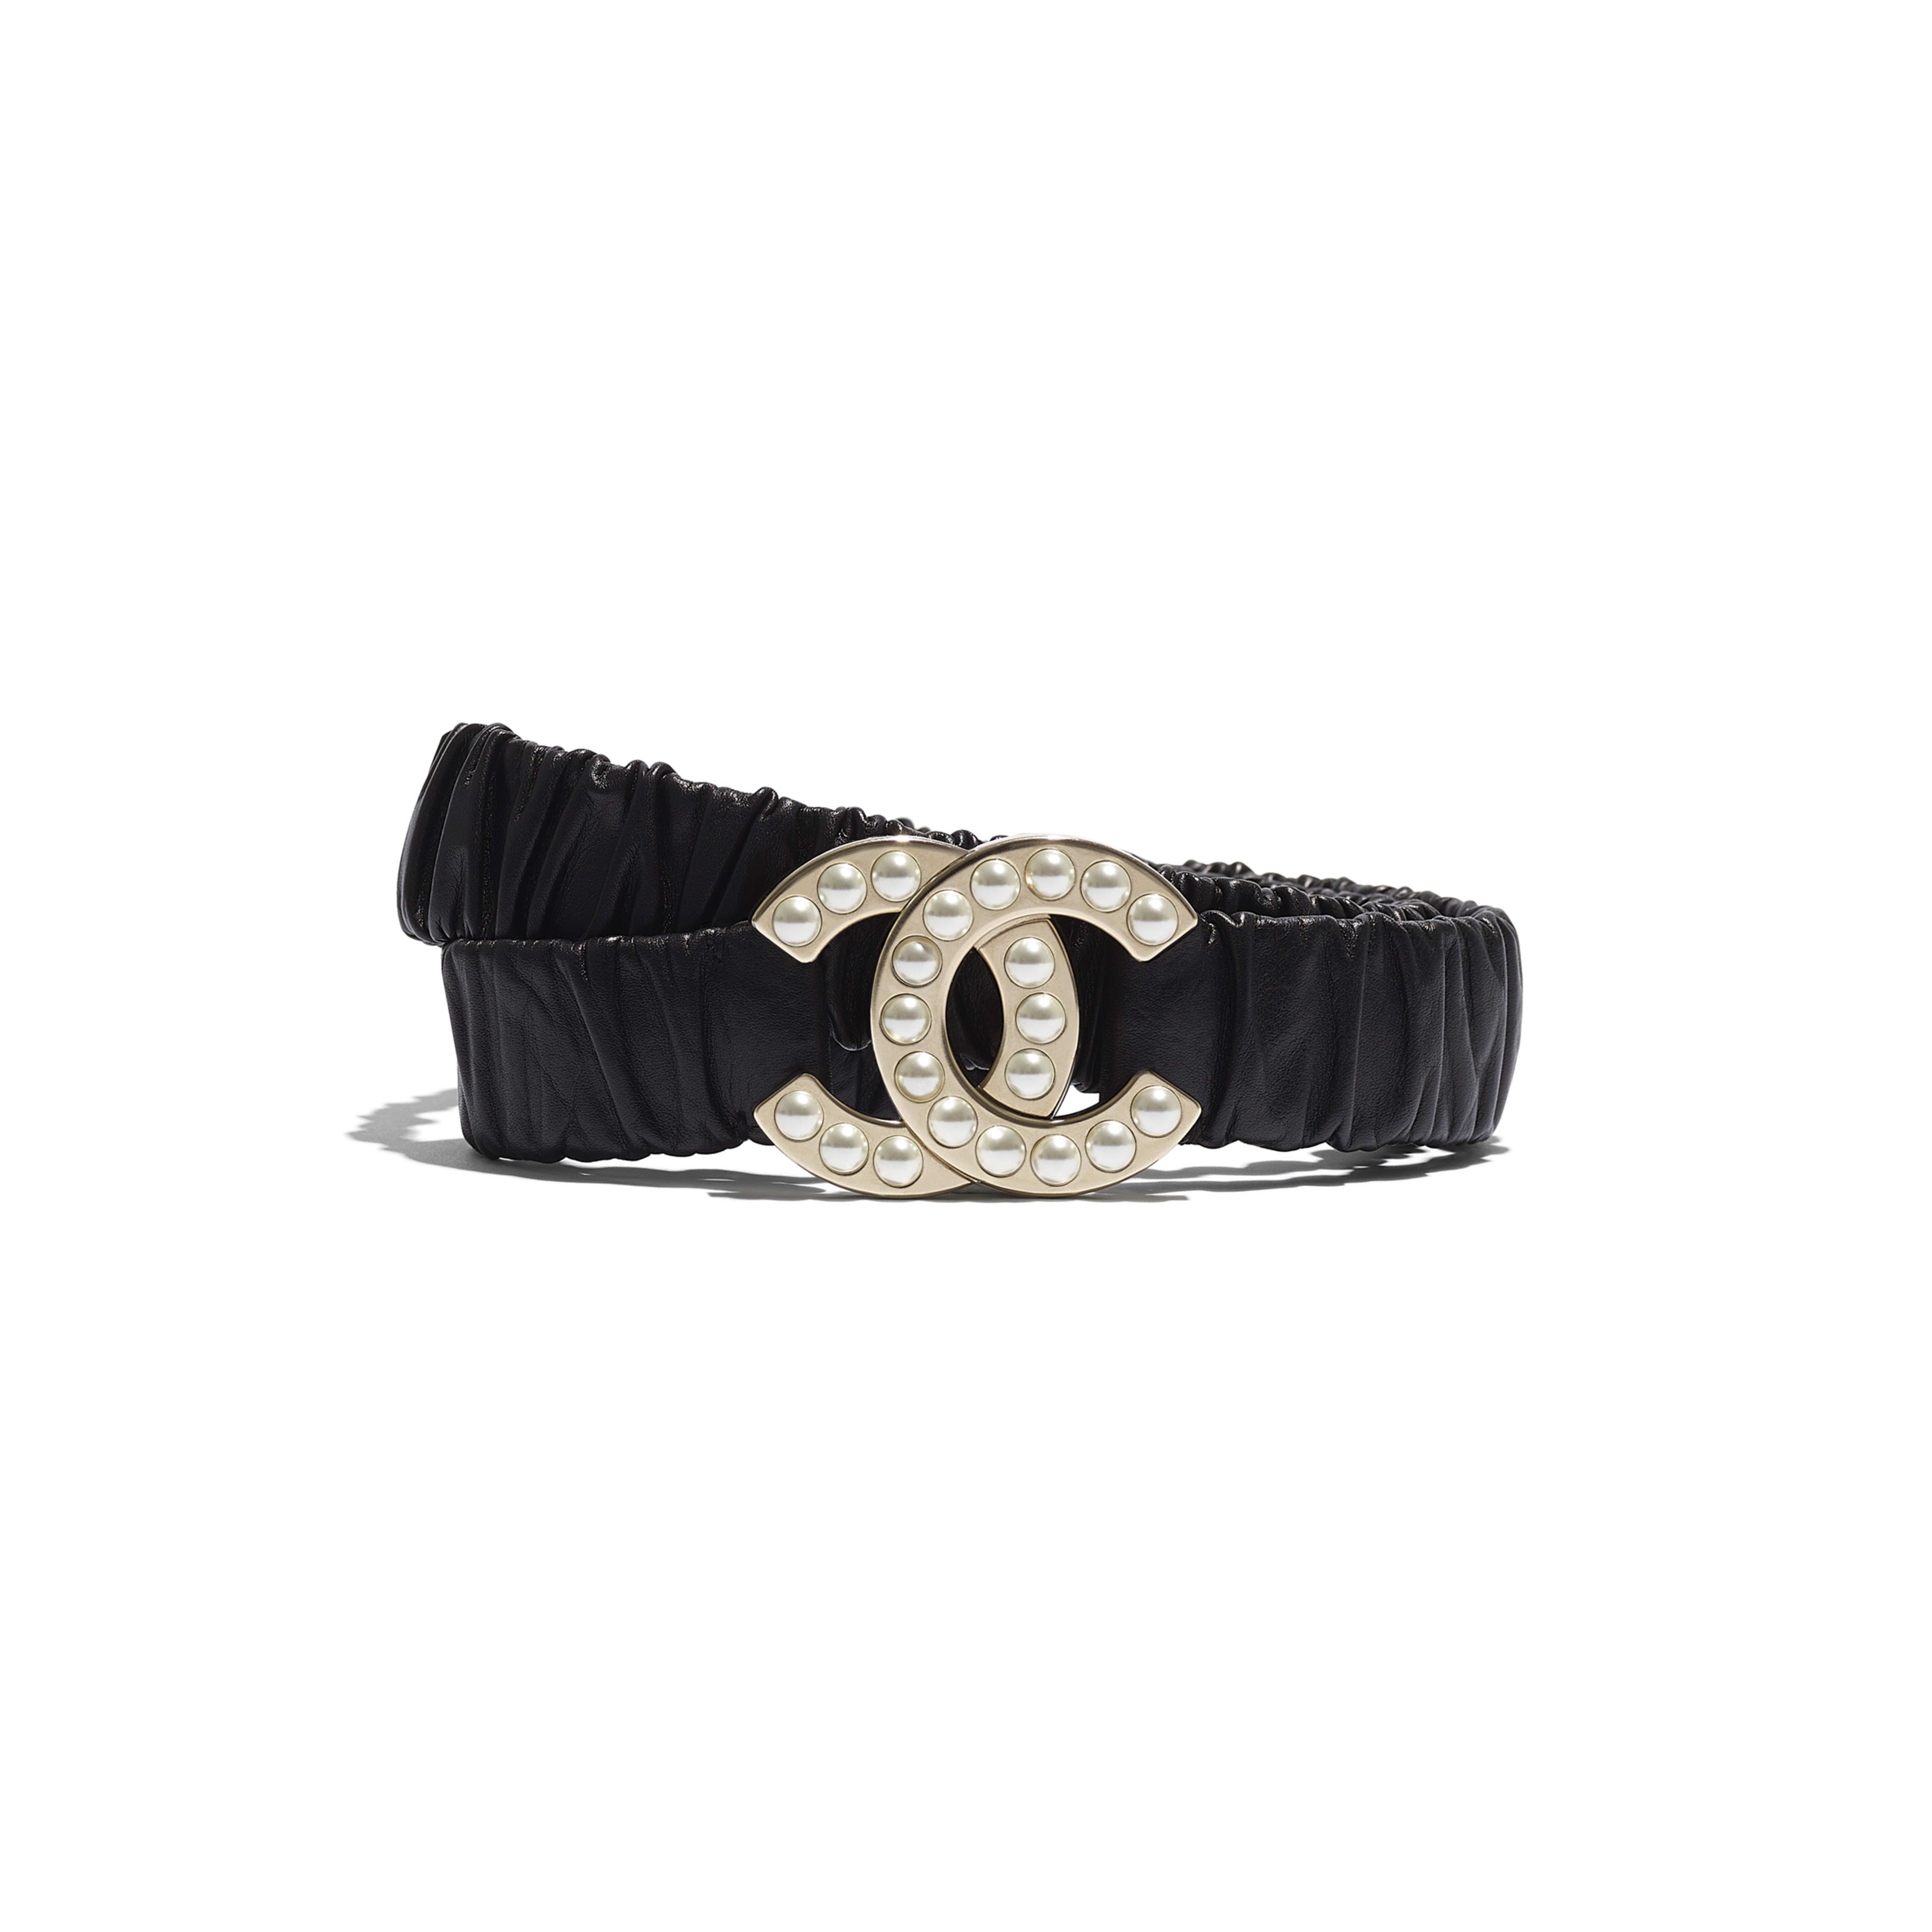 Belt - Black - Calfskin, Gold-Tone Metal & Glass Pearls - Default view - see full sized version